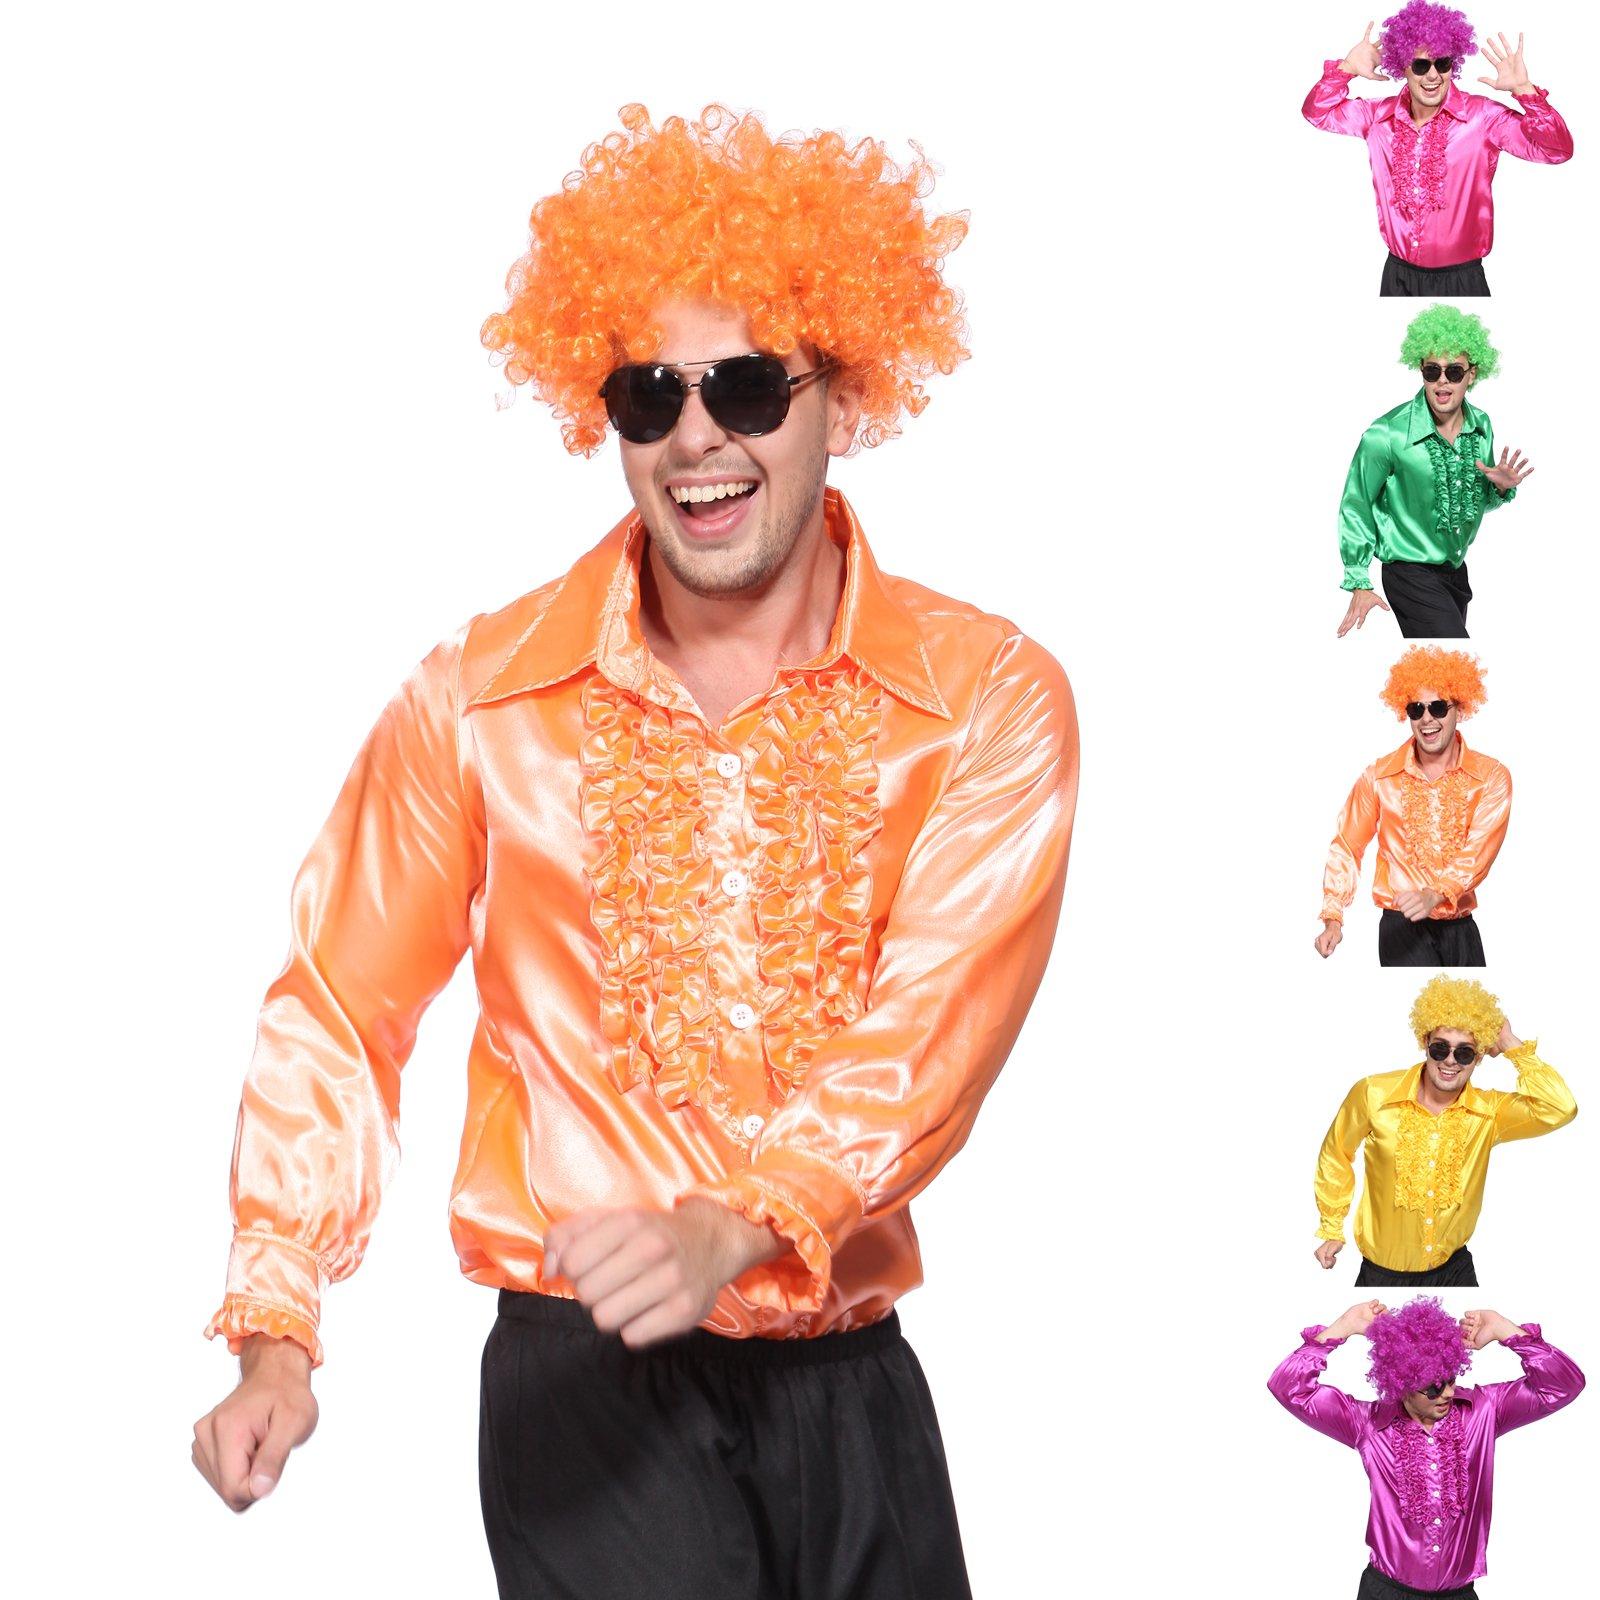 mega farbe r schenhemd schlagerhemd herrenhemd karneval gruppenkost m outfit ebay. Black Bedroom Furniture Sets. Home Design Ideas